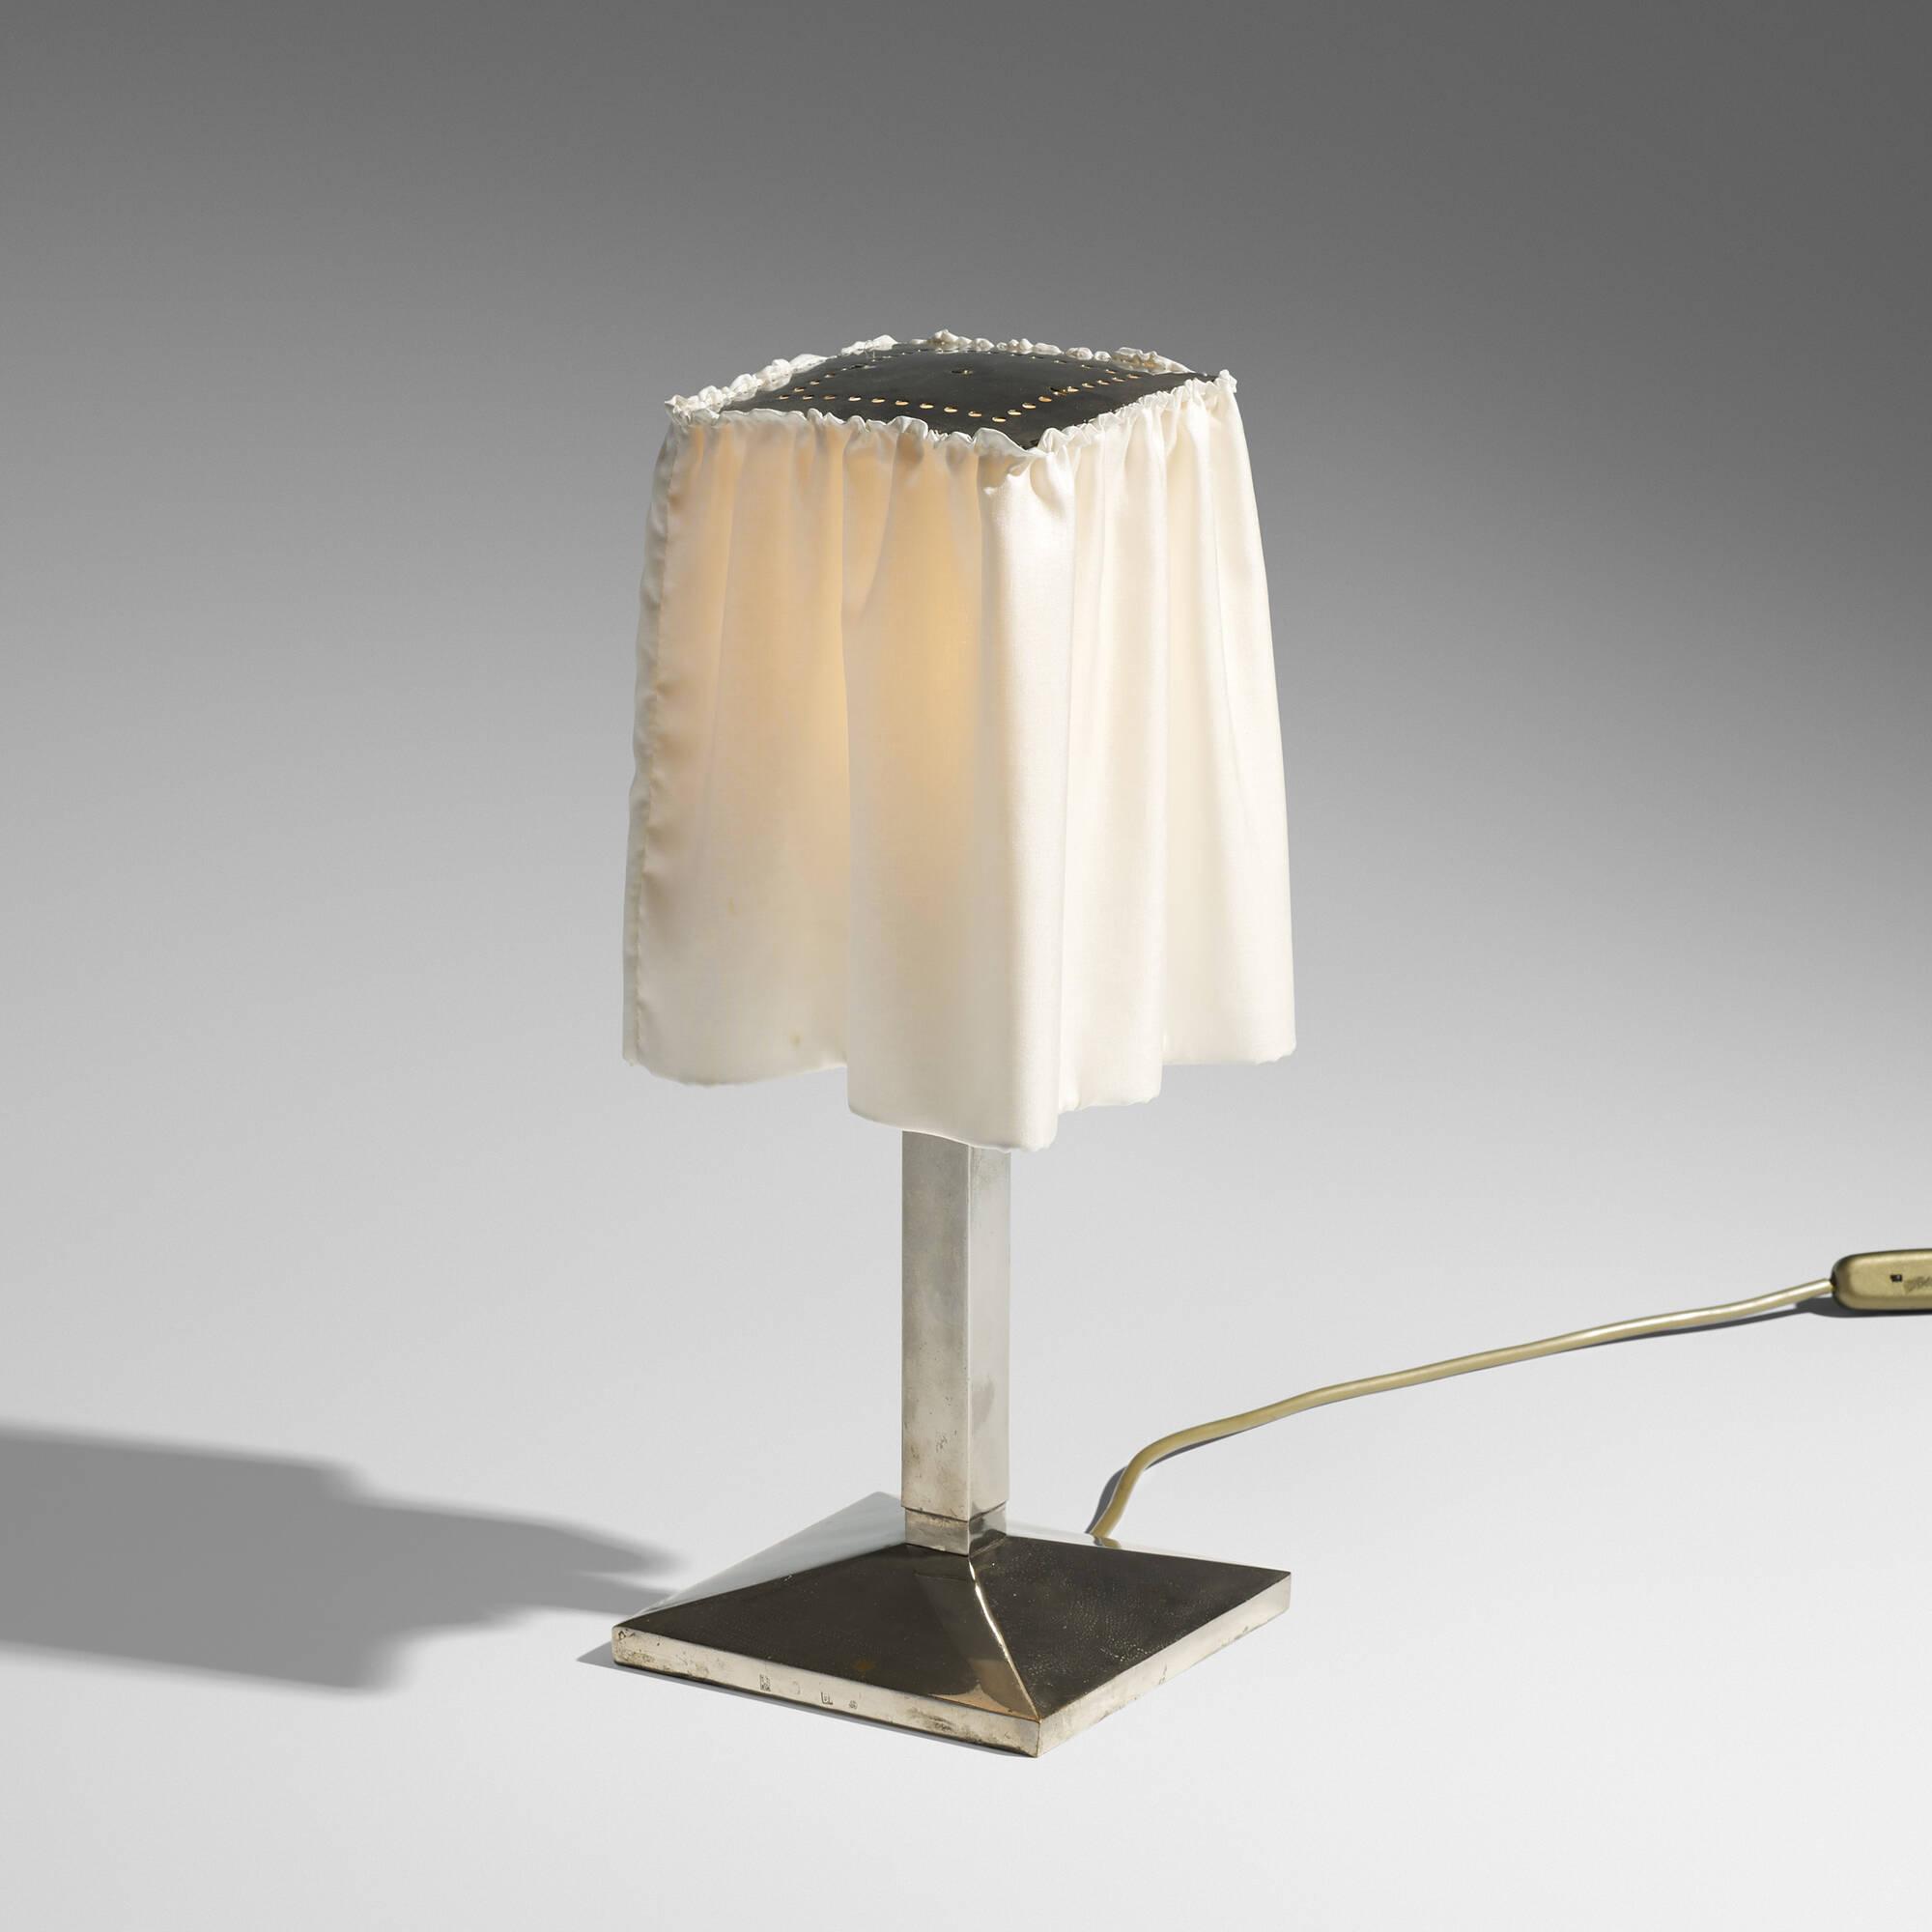 Josef Hoffmann Design.3 Josef Hoffmann Table Lamp Design Masterworks 19 May